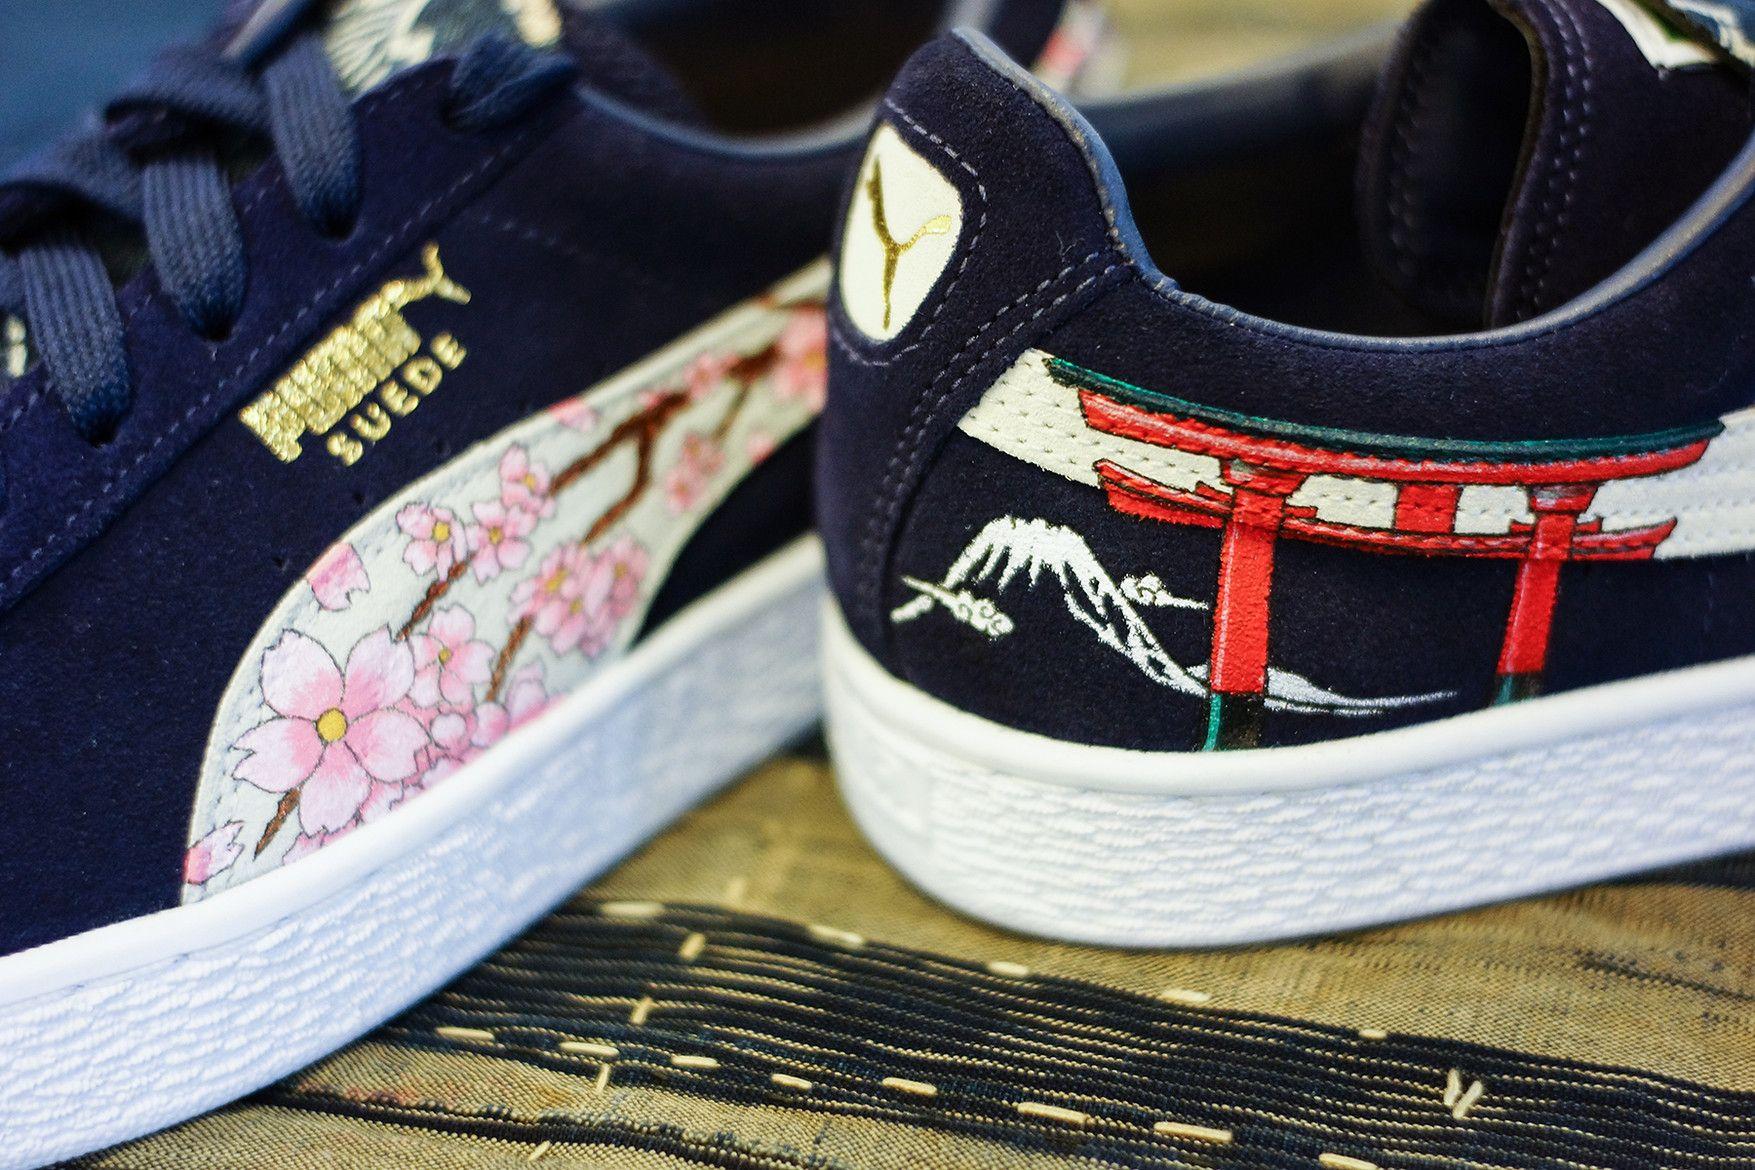 Traditional Custom A Puma Ukiyo E Sees The Suede nwPO0k